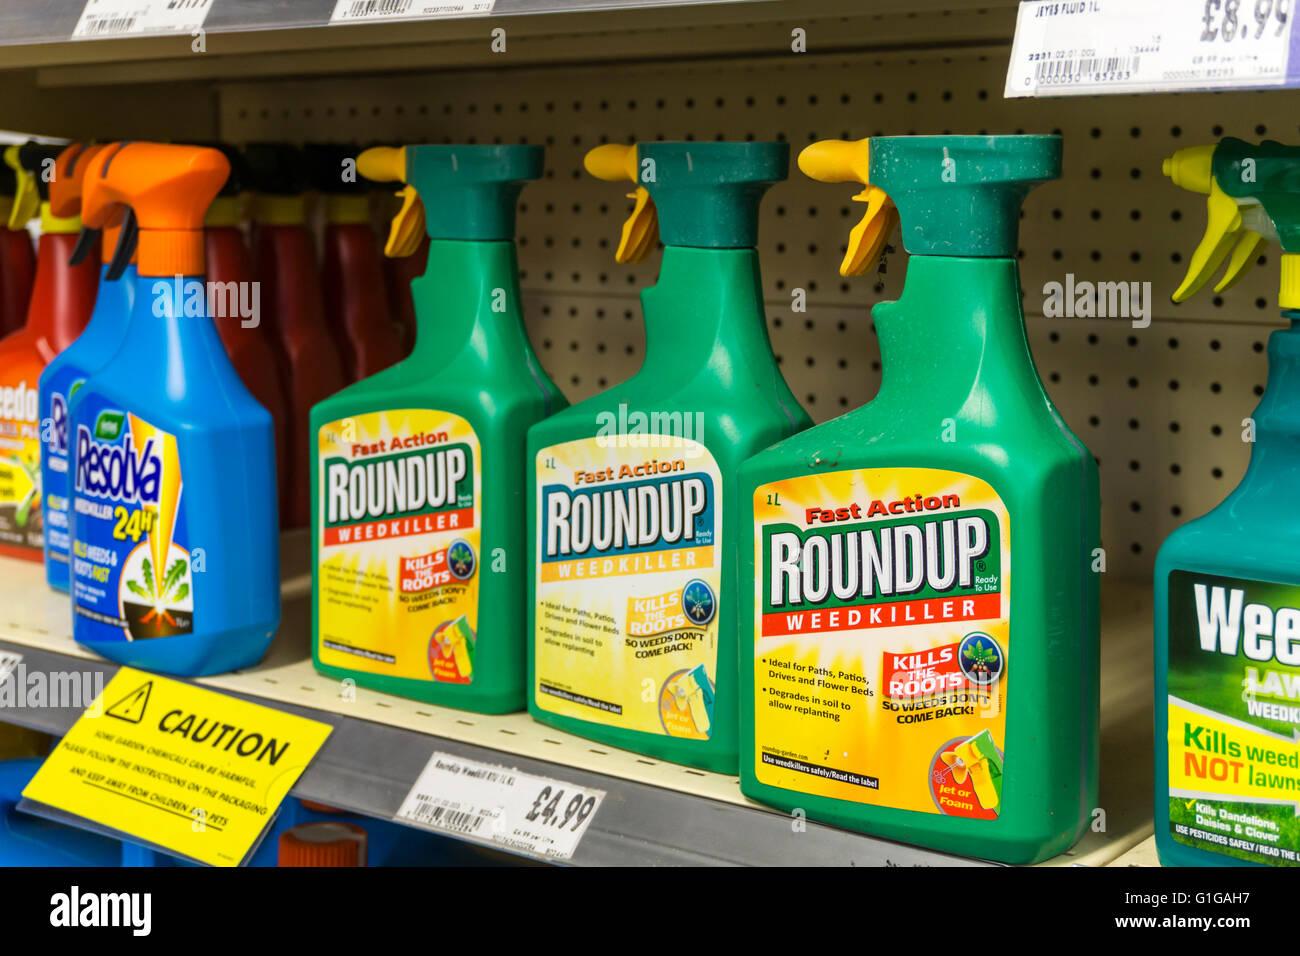 Spray Bottles Of Roundup Weedkiller